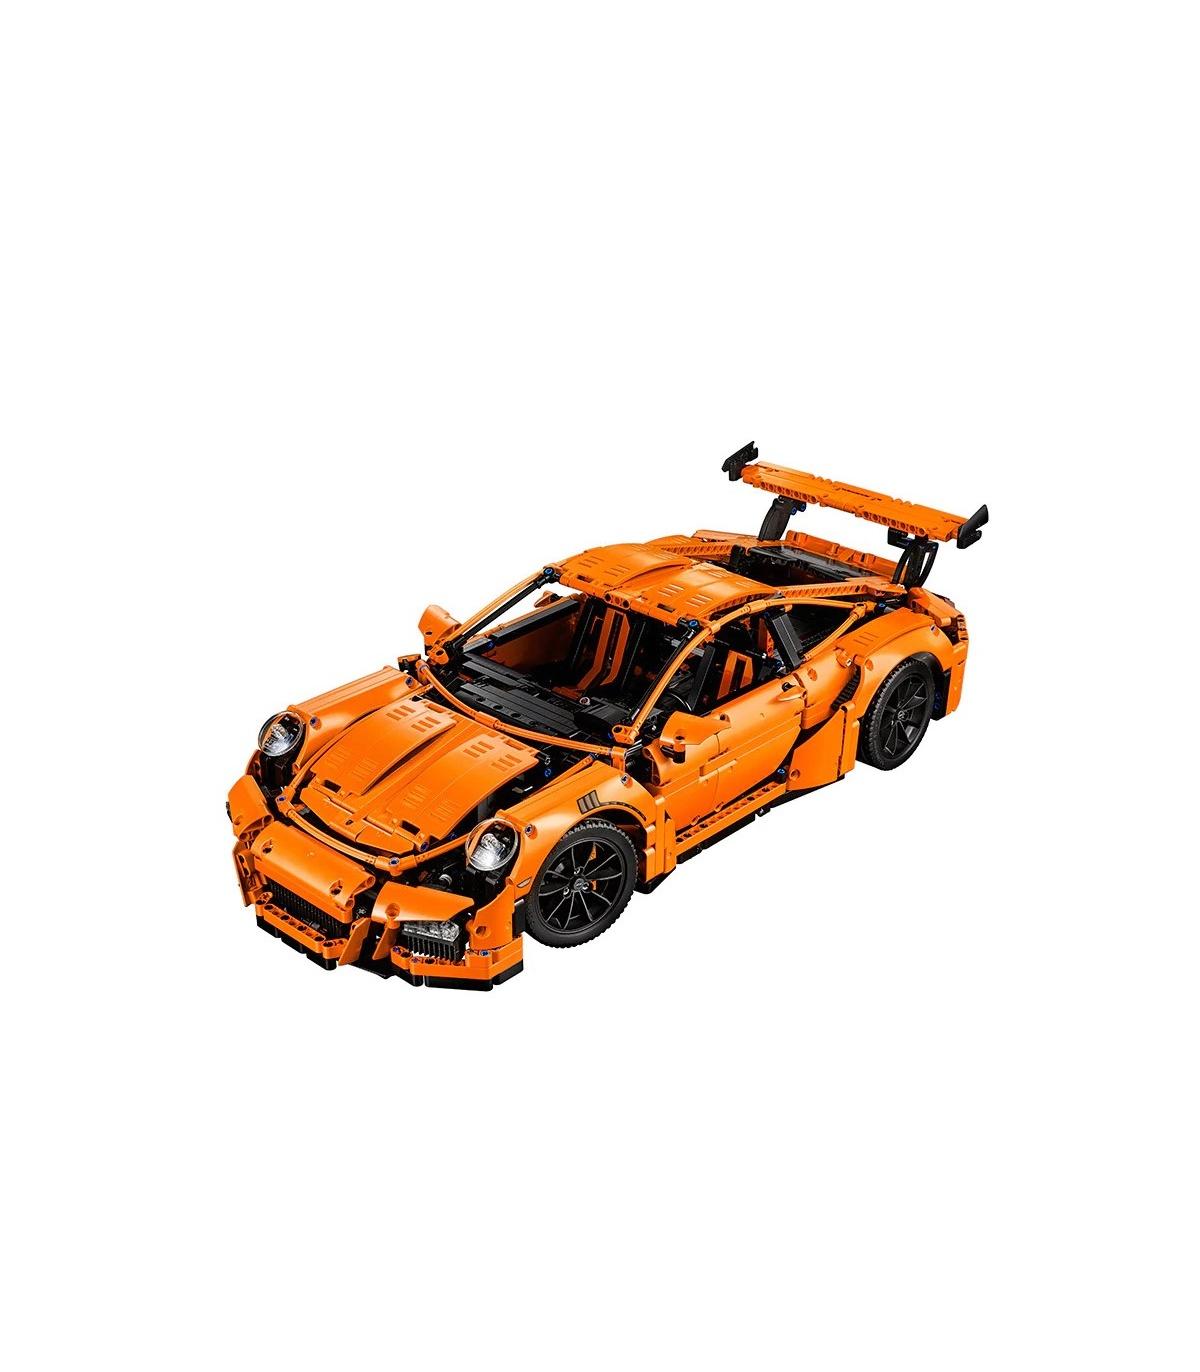 Custom Technic Porsche 911 Gt3 Rs Compatible Building Bricks